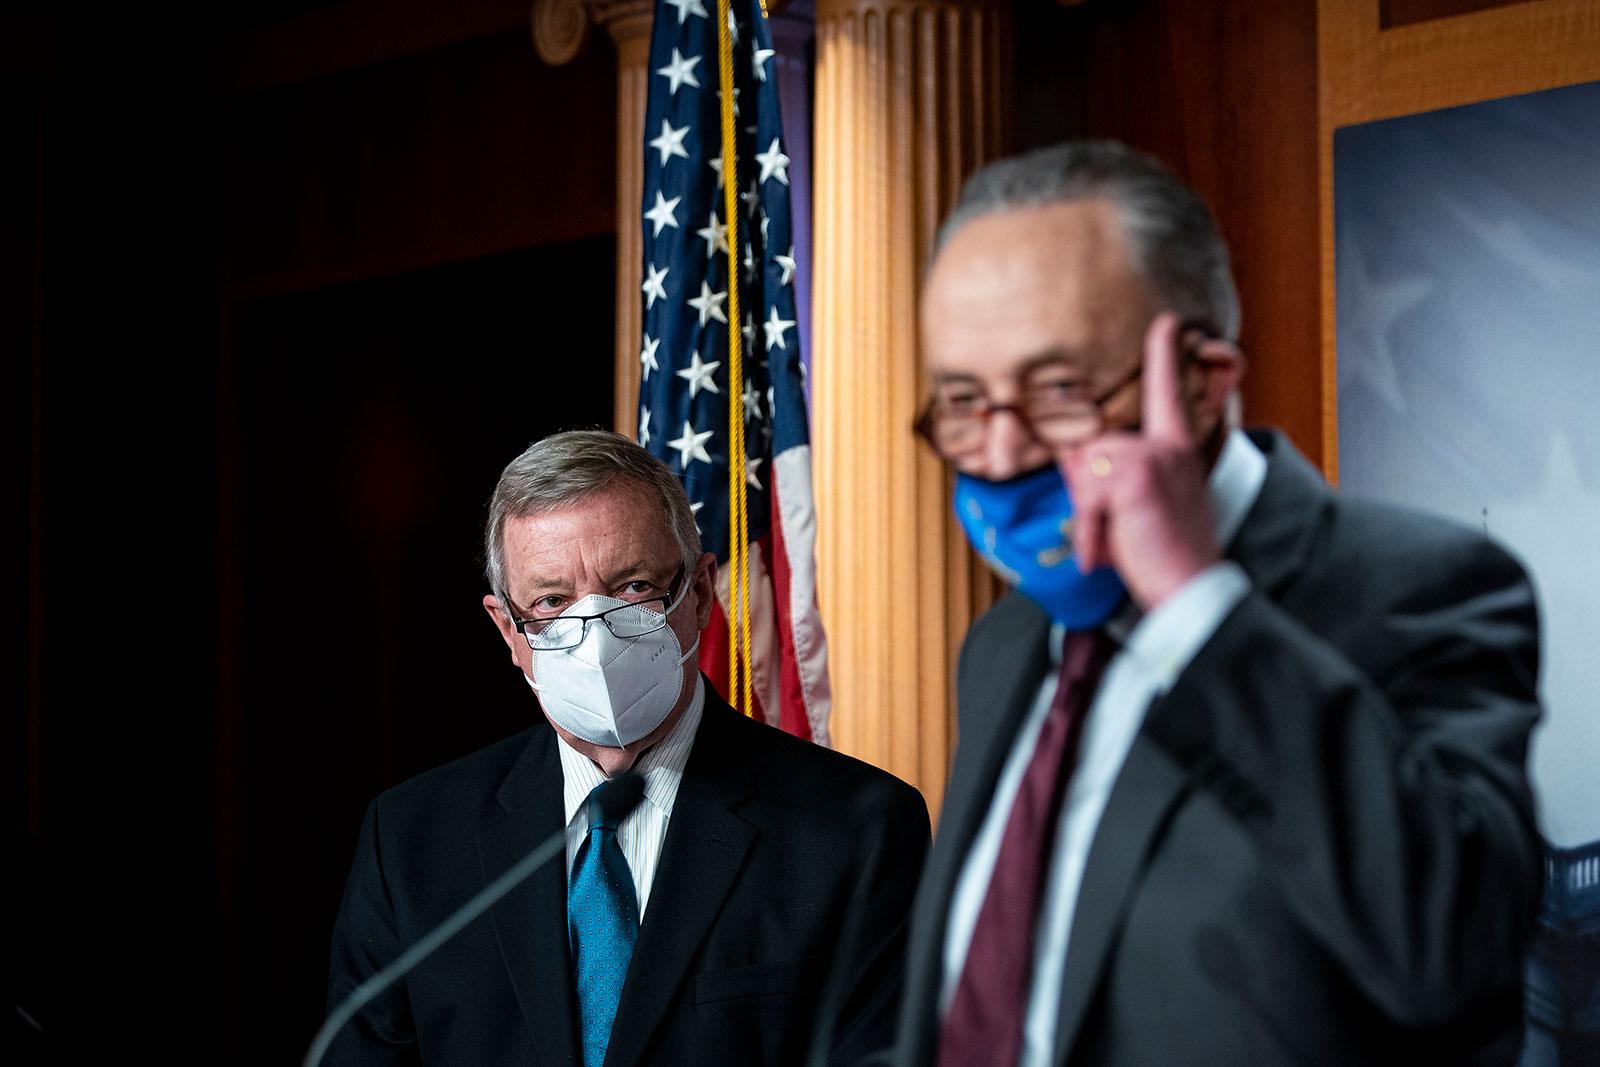 Al Drago/Getty Images